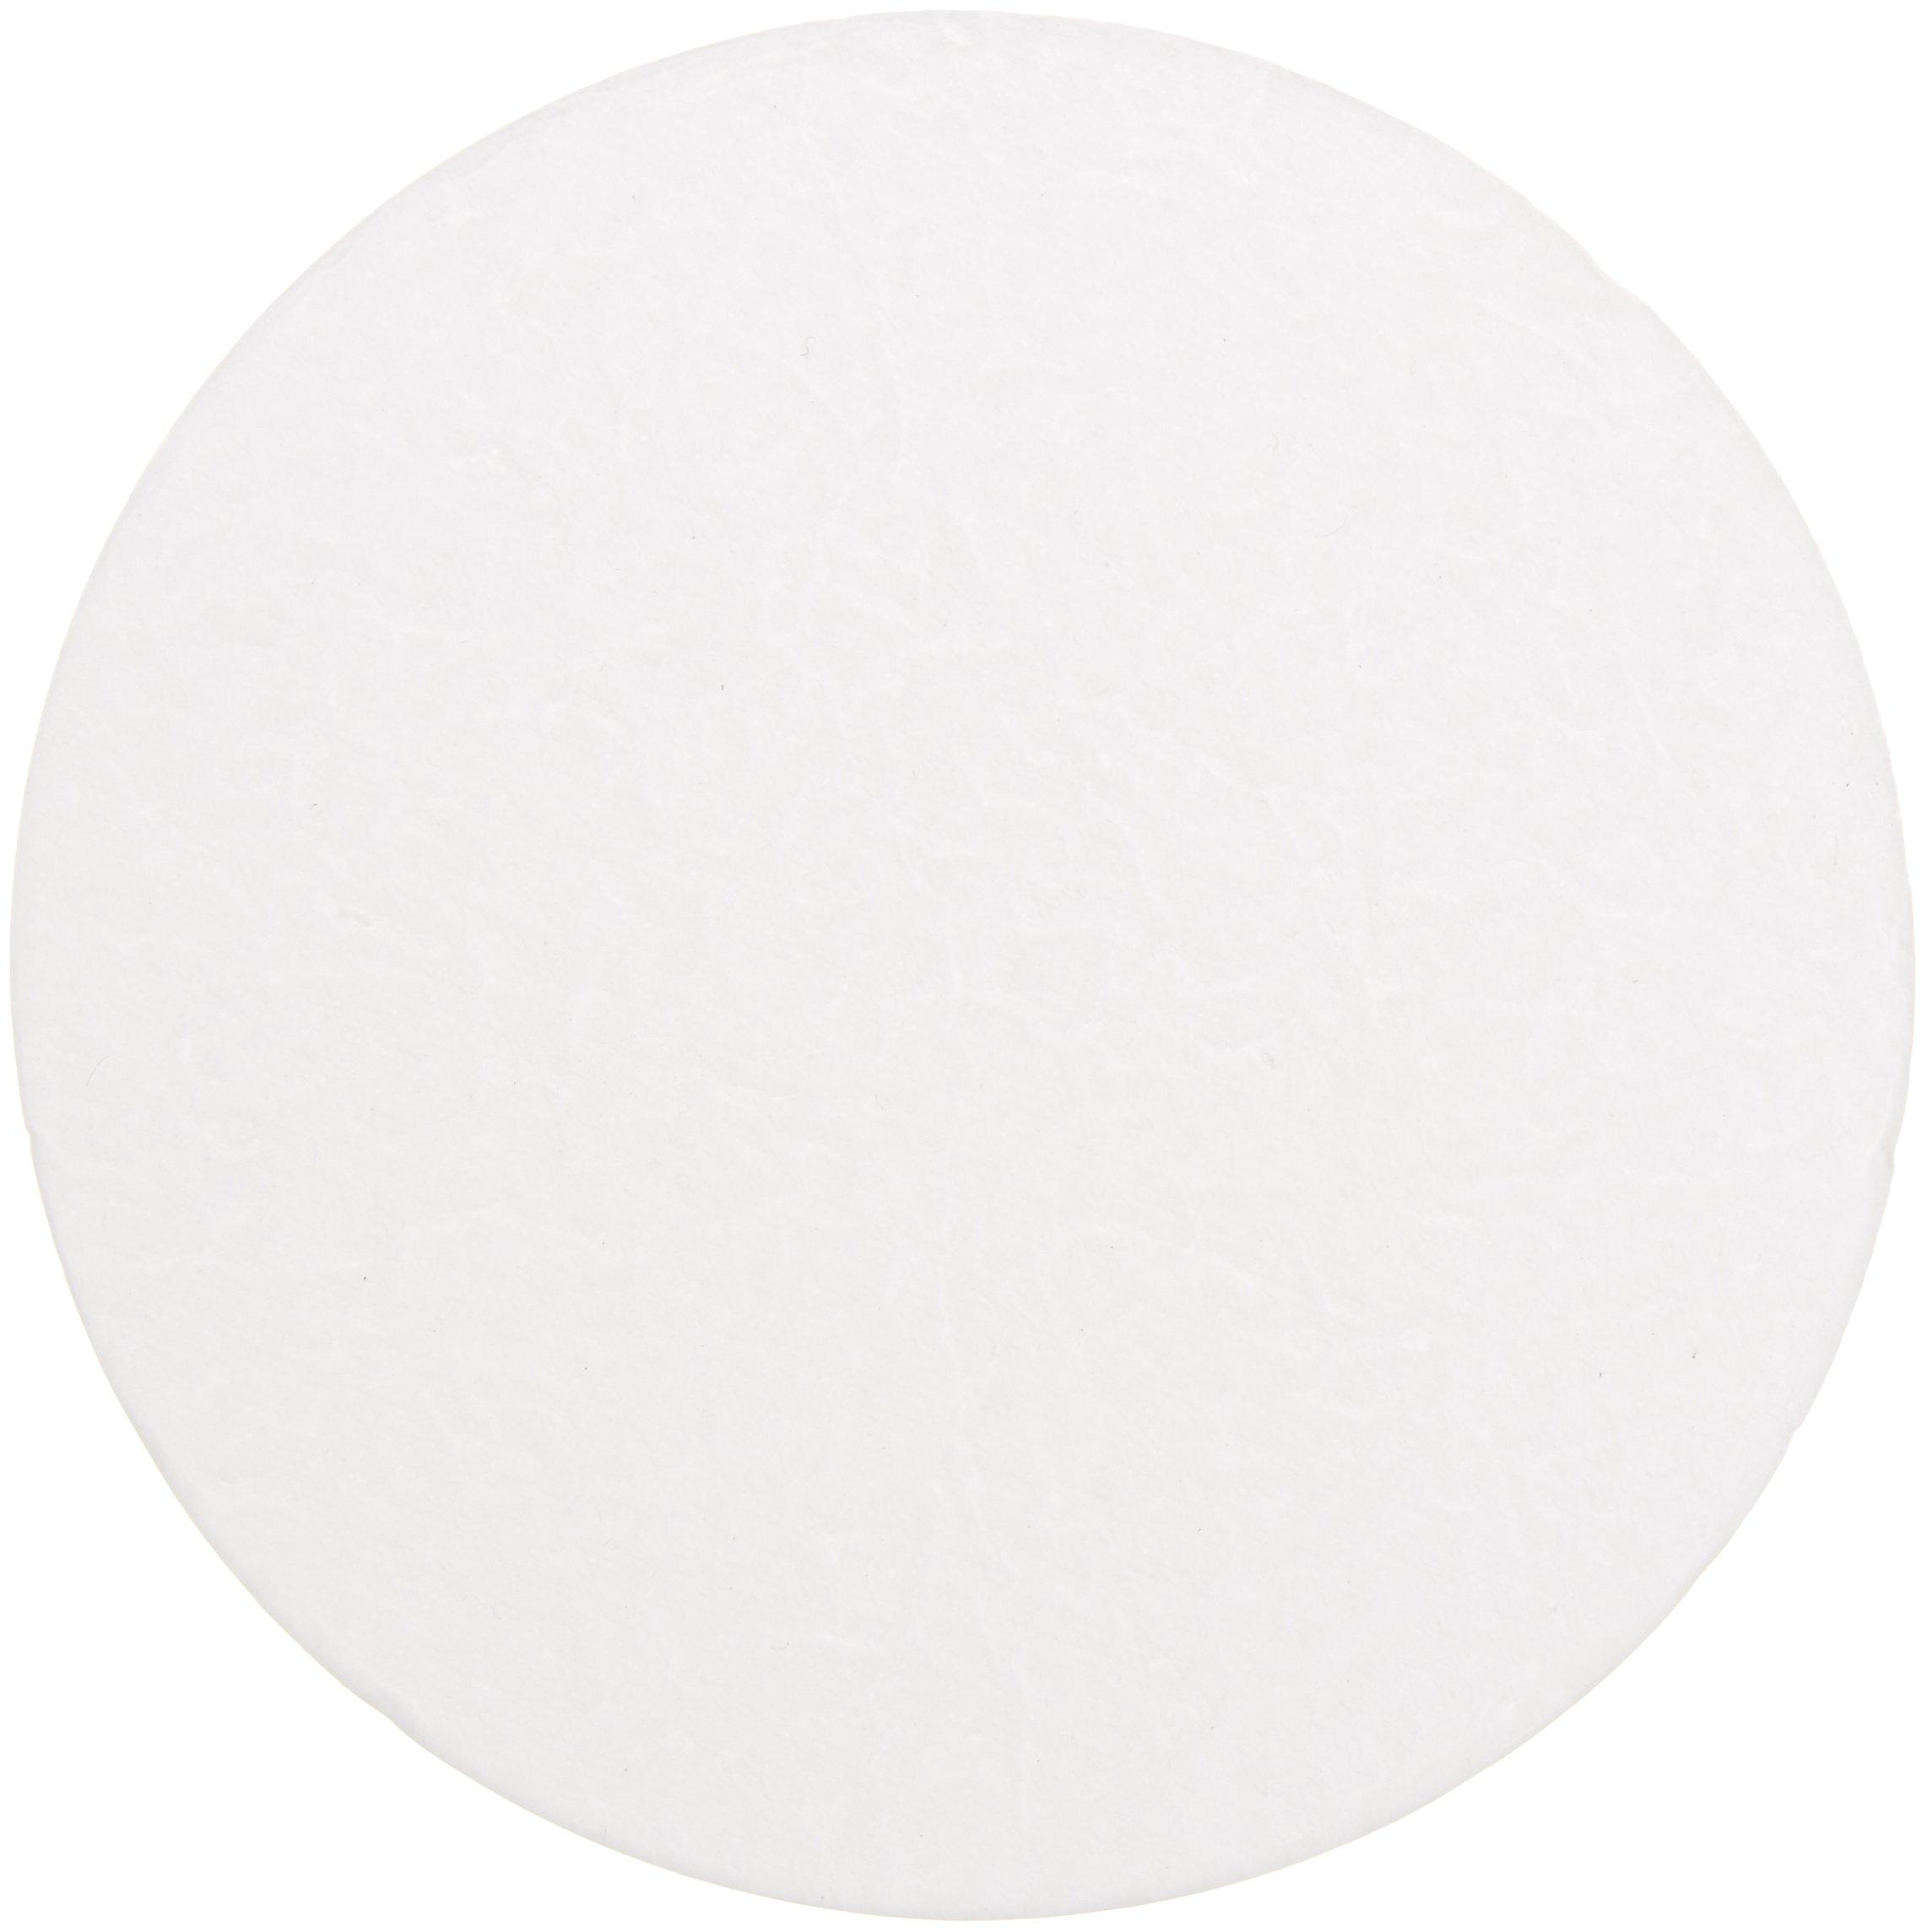 GE Whatman 1823-110 Borosilicate Glass Microfiber Filter, Binder Free, Grade GF/D, Circle, 2.7µm Pore Size, 110mm Diameter (Pack of 25)